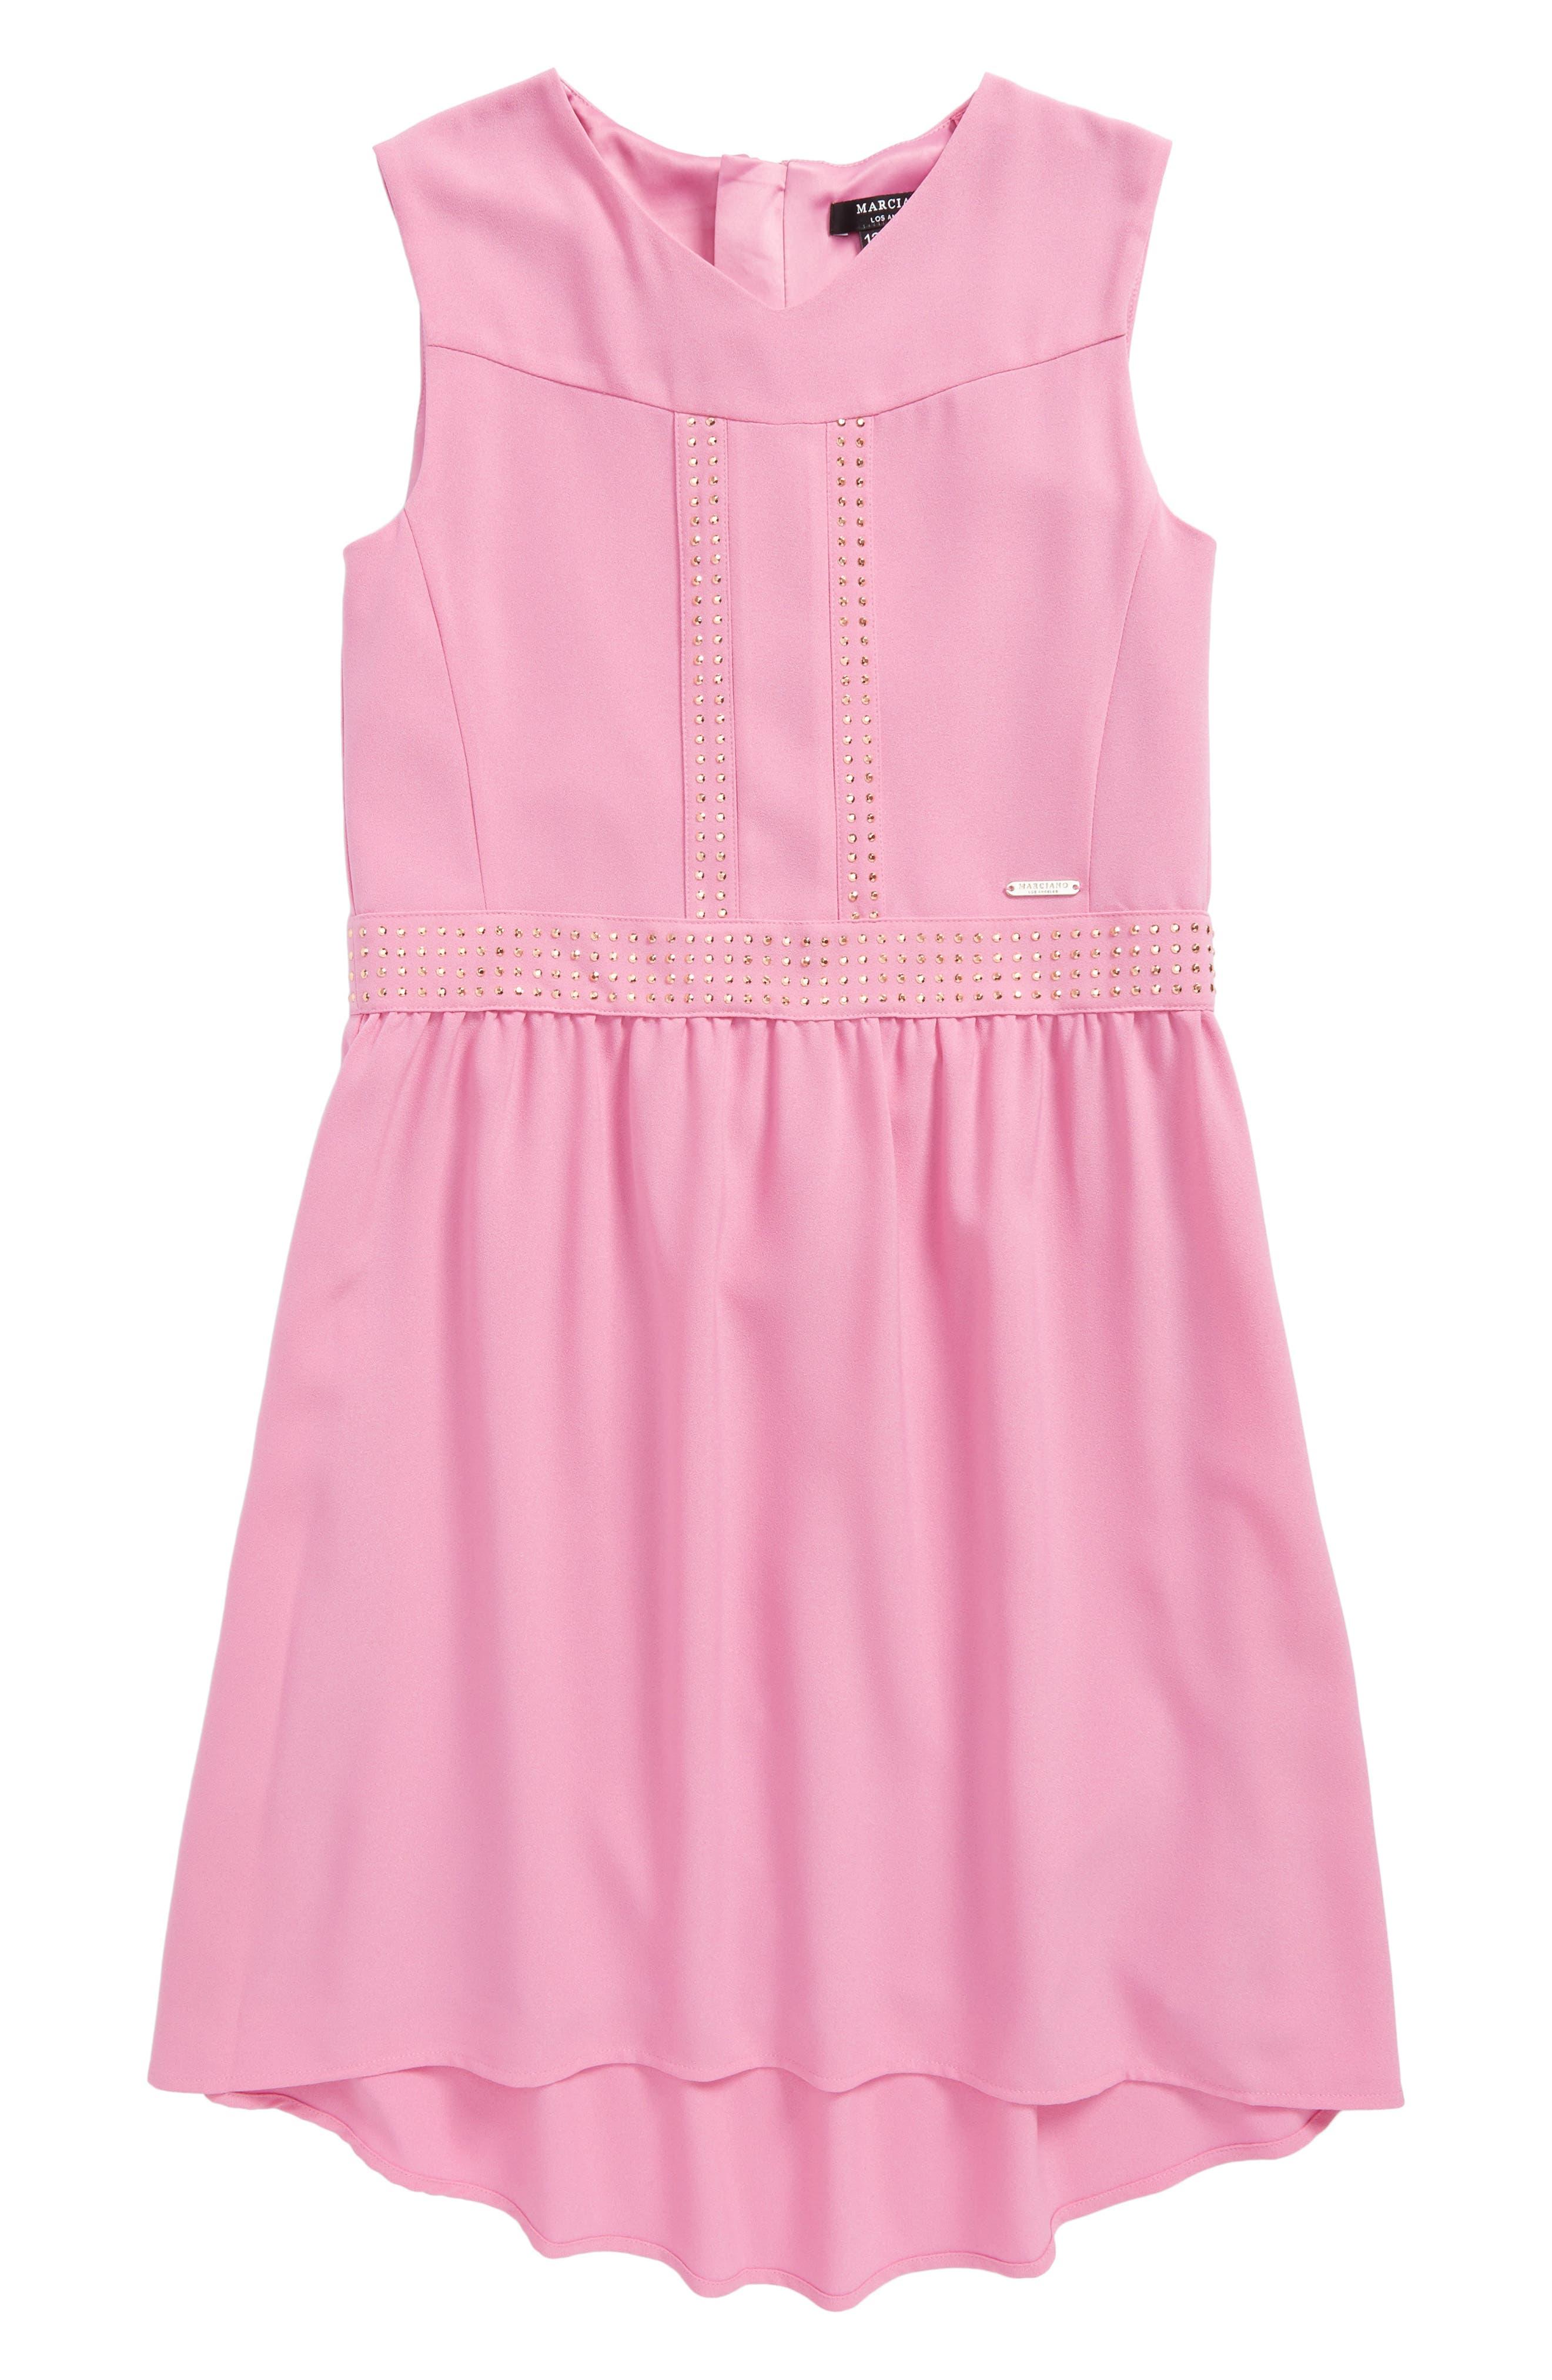 Main Image - Marciano Embellished Crepe High/Low Dress (Big Girls)